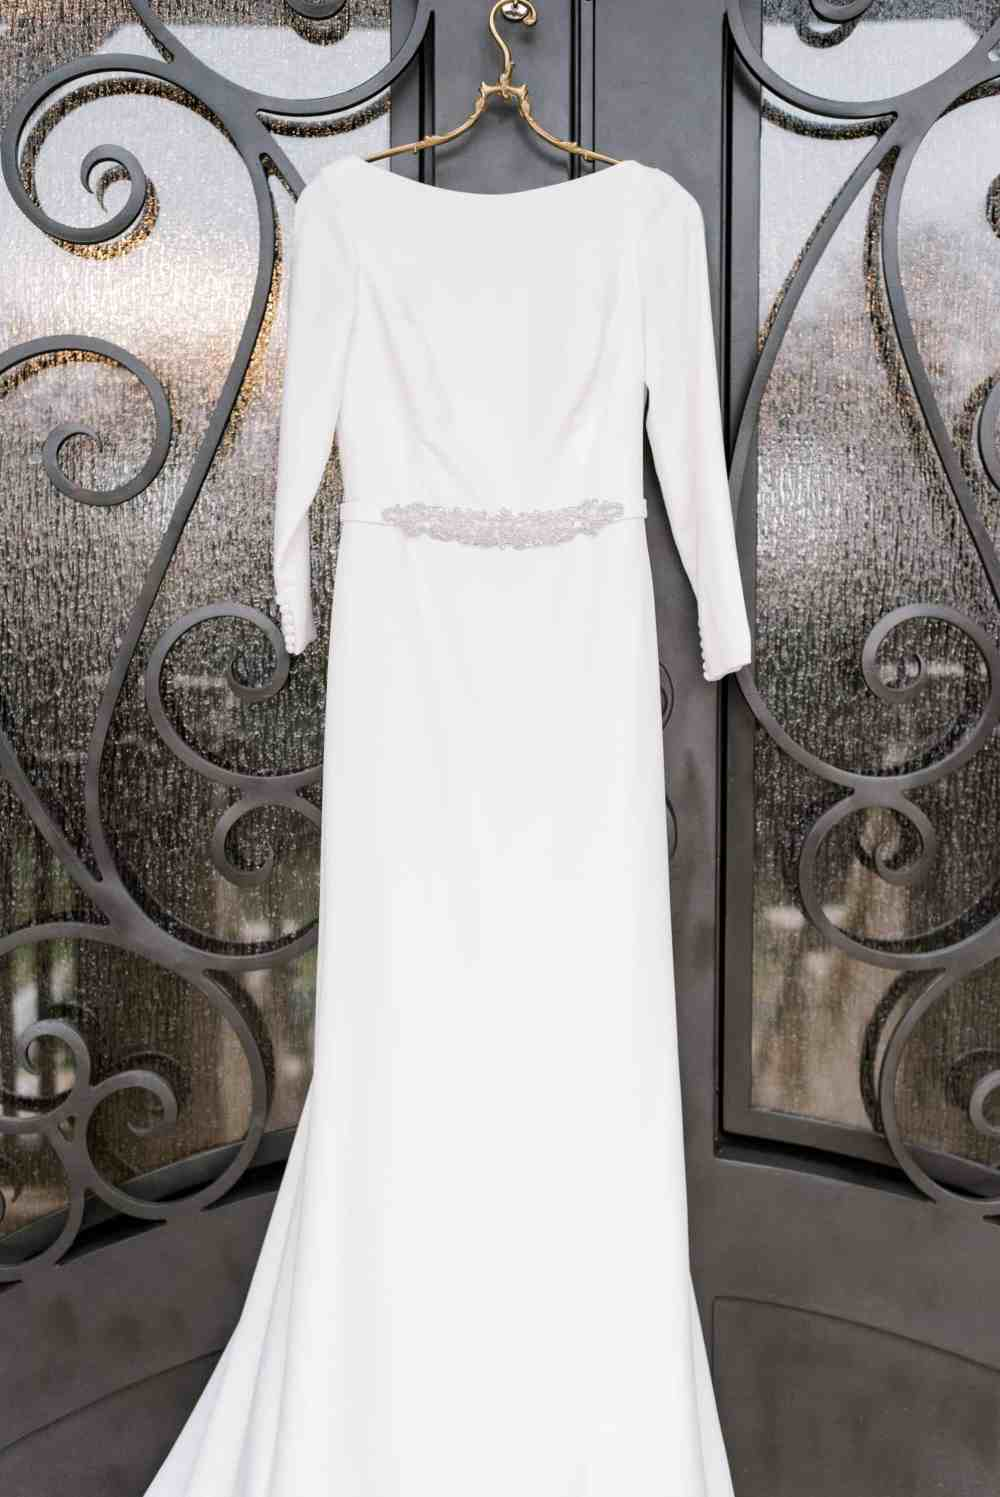 Werdding Dress hanging on Antique Wedding Hanger